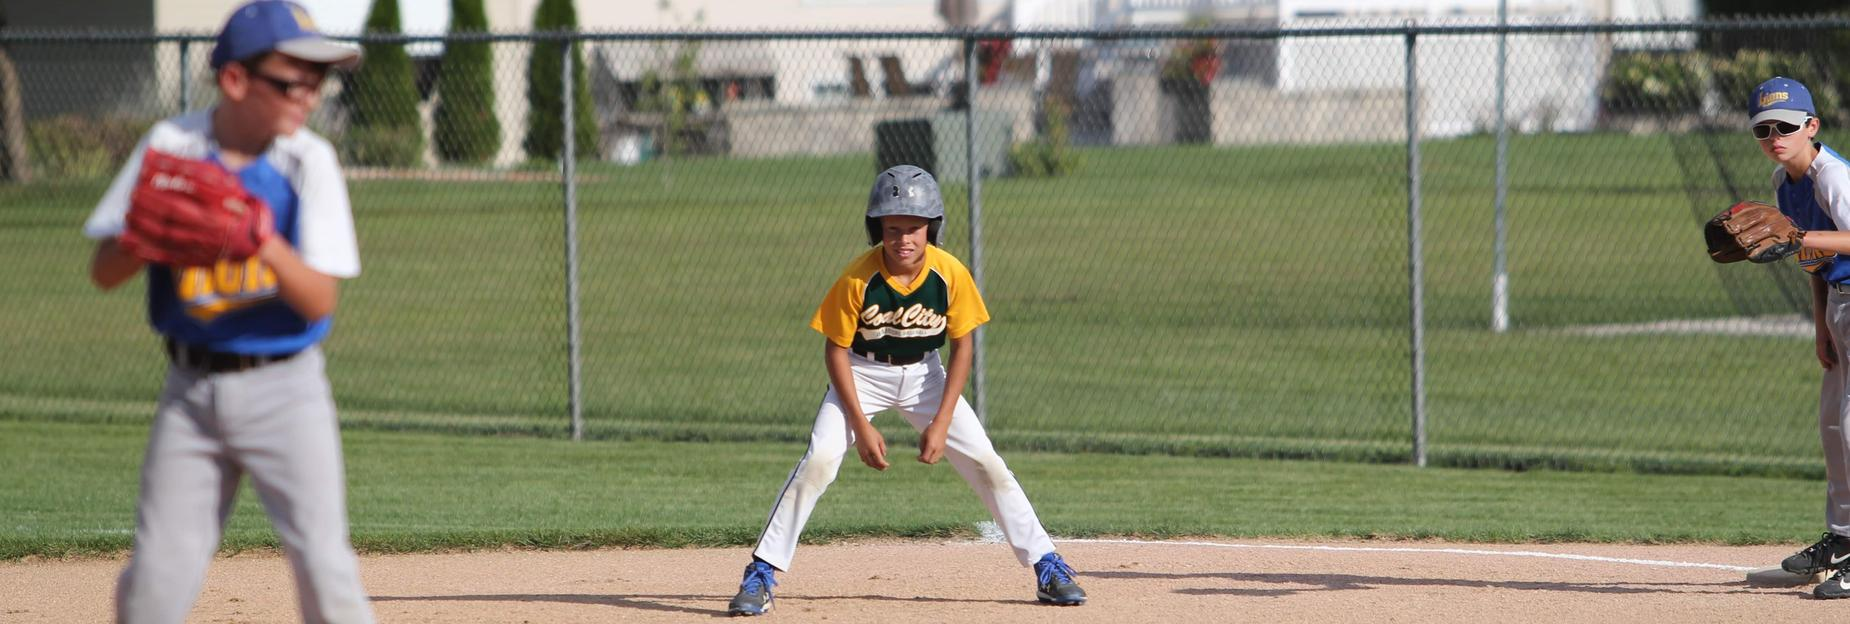 CCMS Baseball C